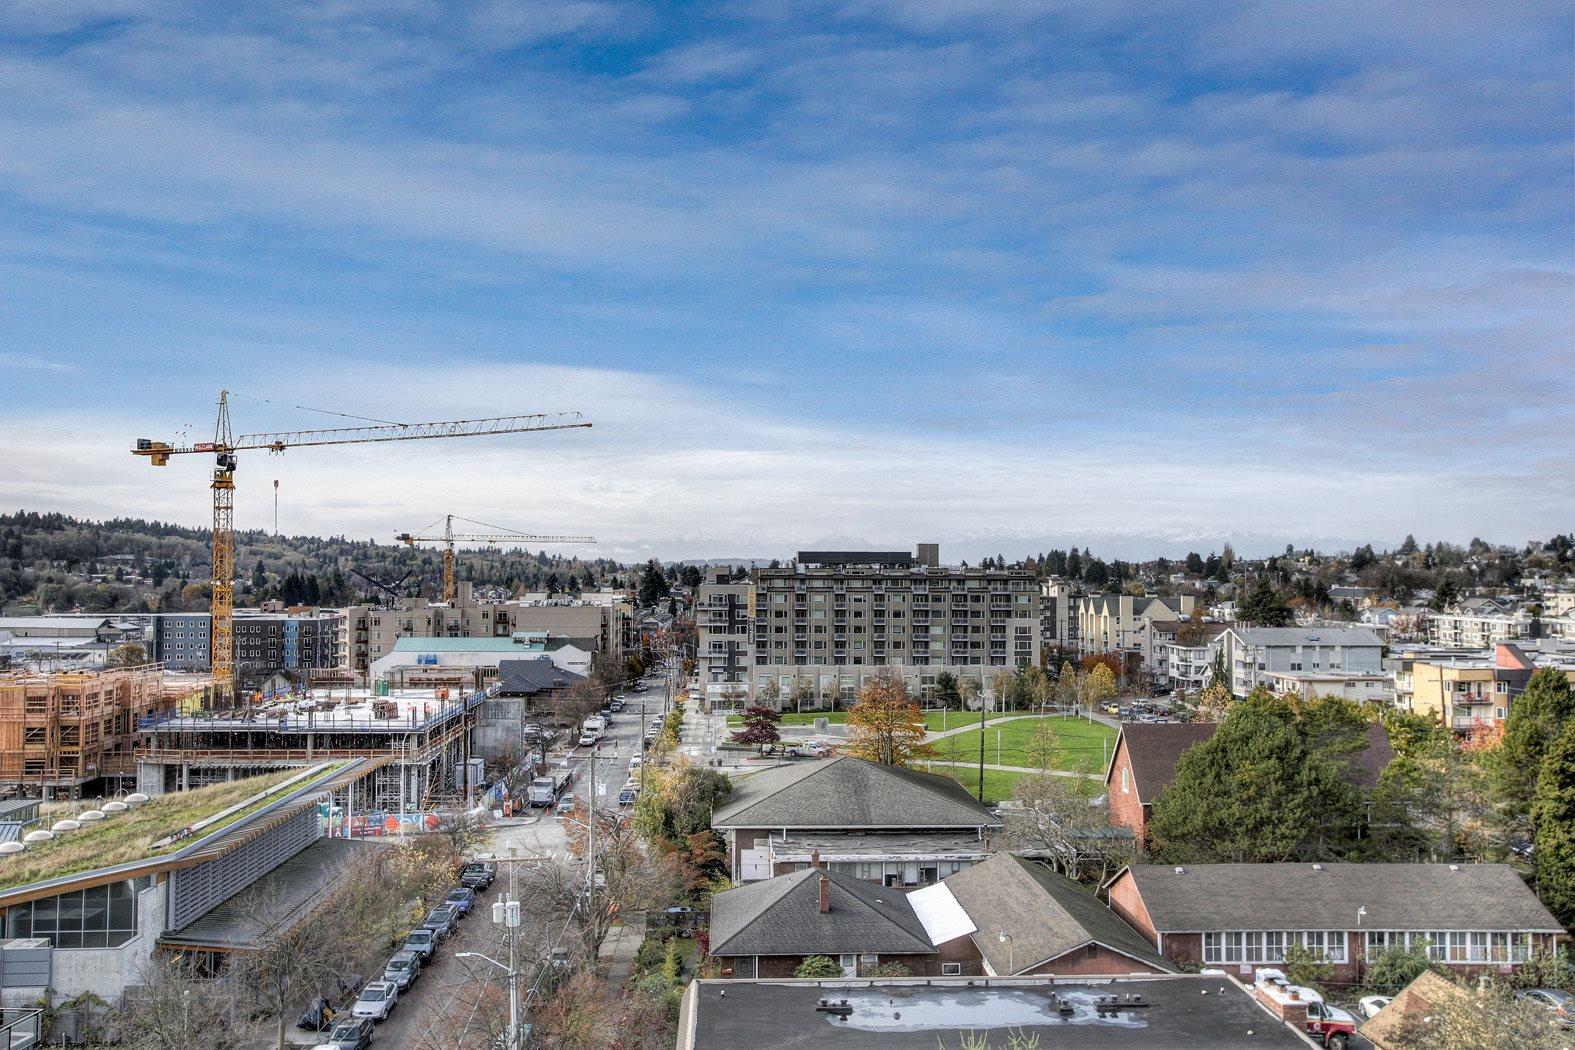 Seattle photogallery 23